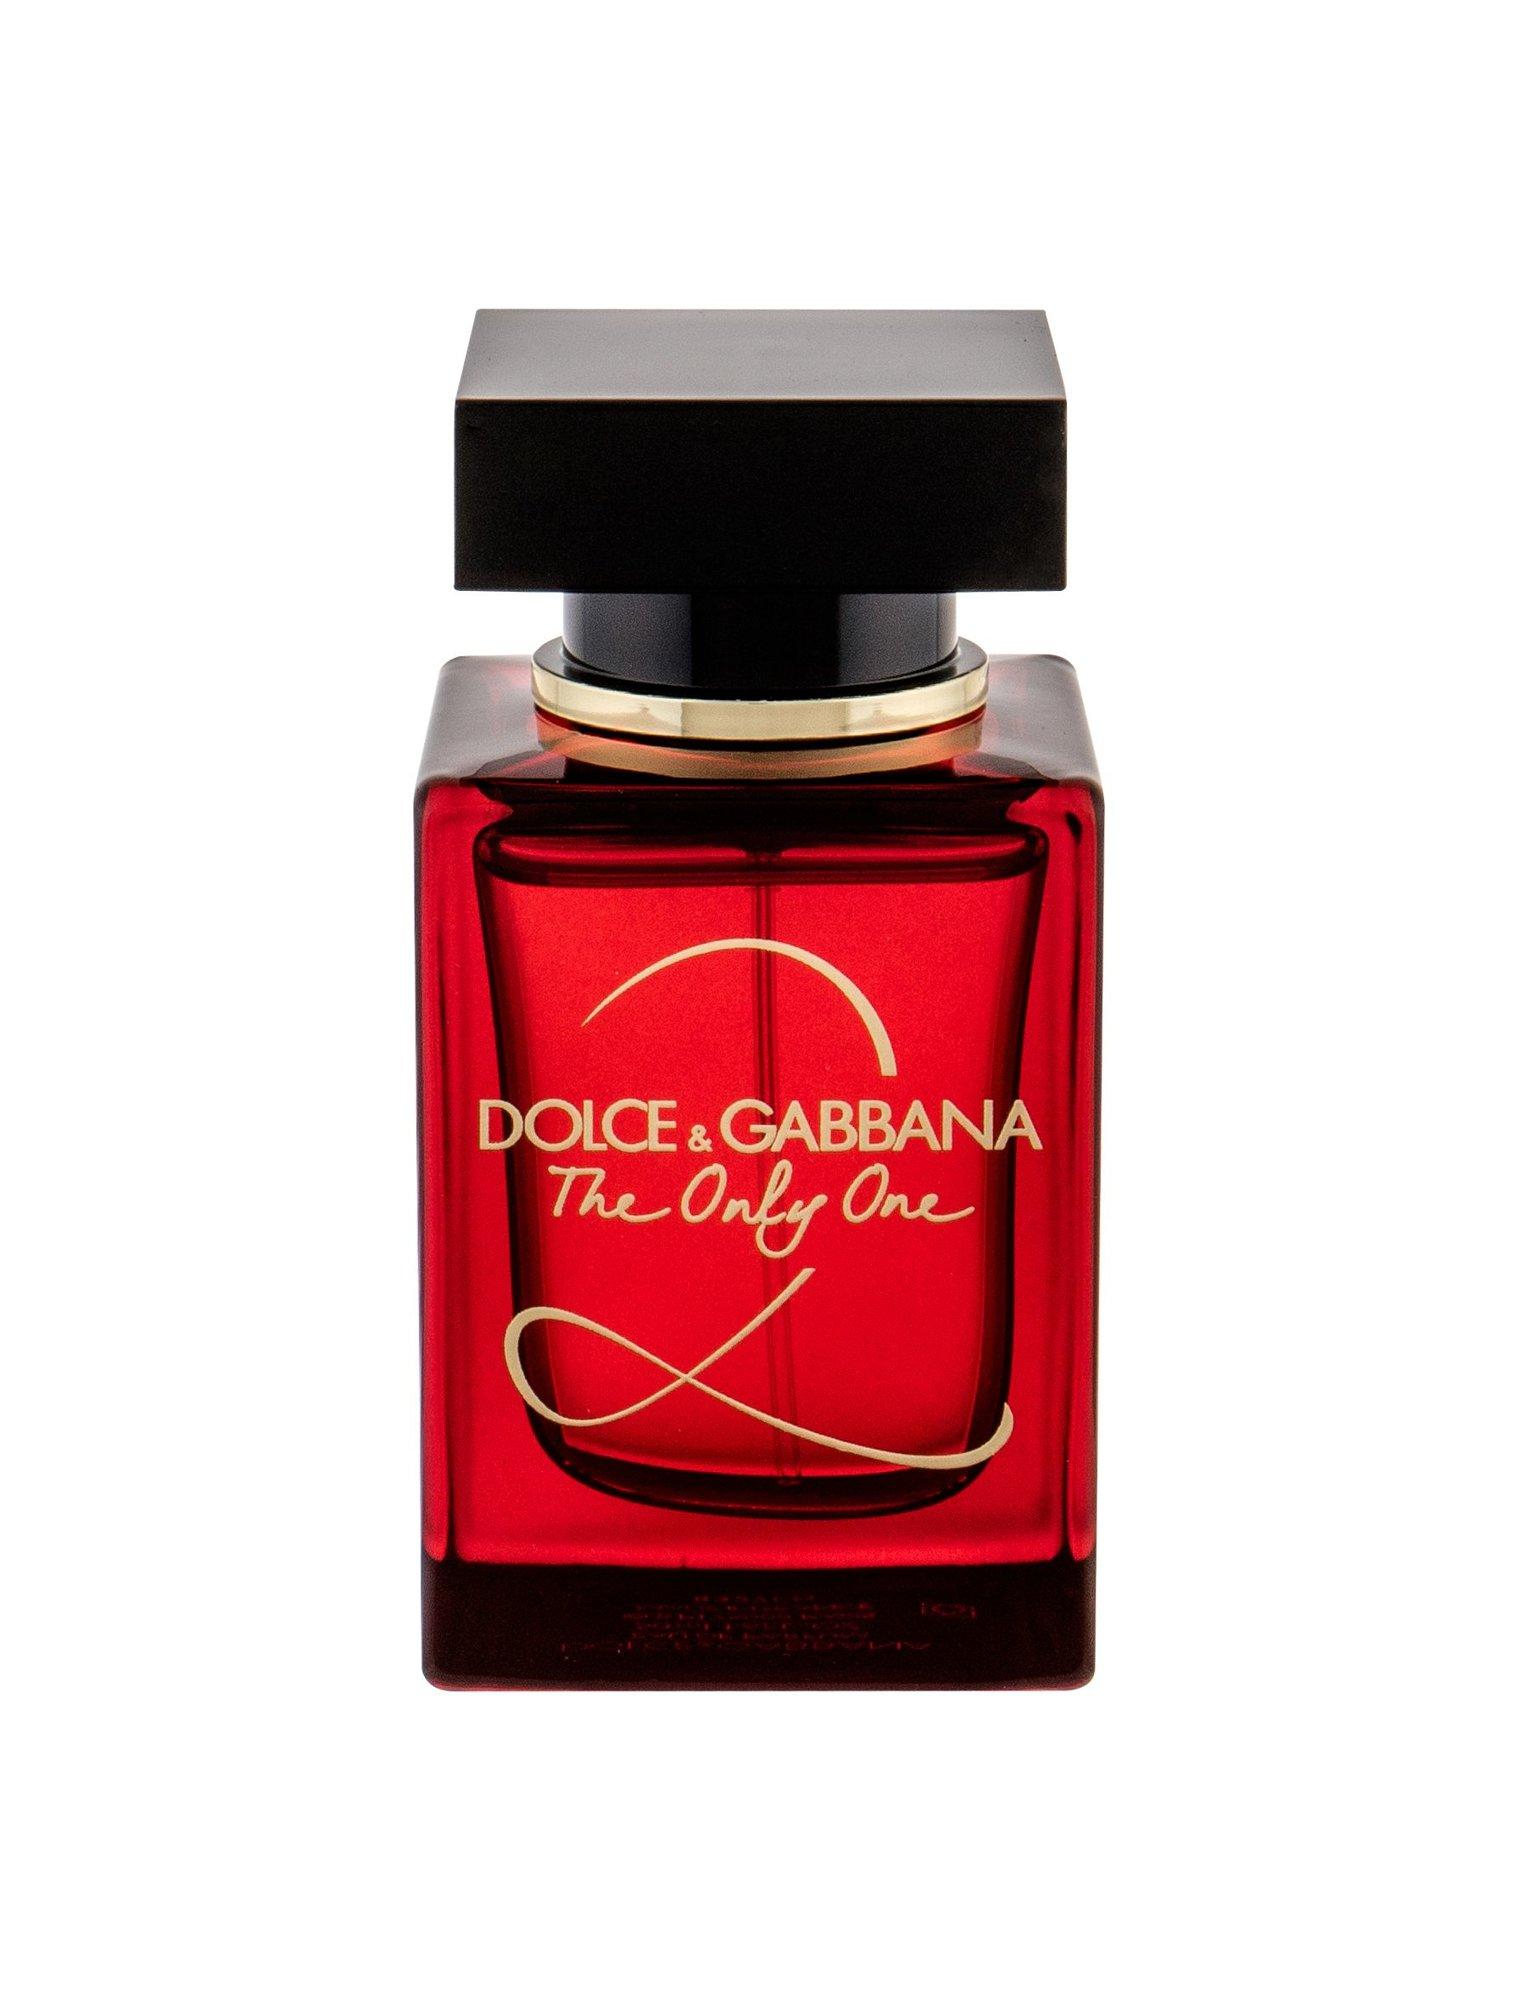 Dolce&Gabbana The Only One 2, Parfumovaná voda 100ml